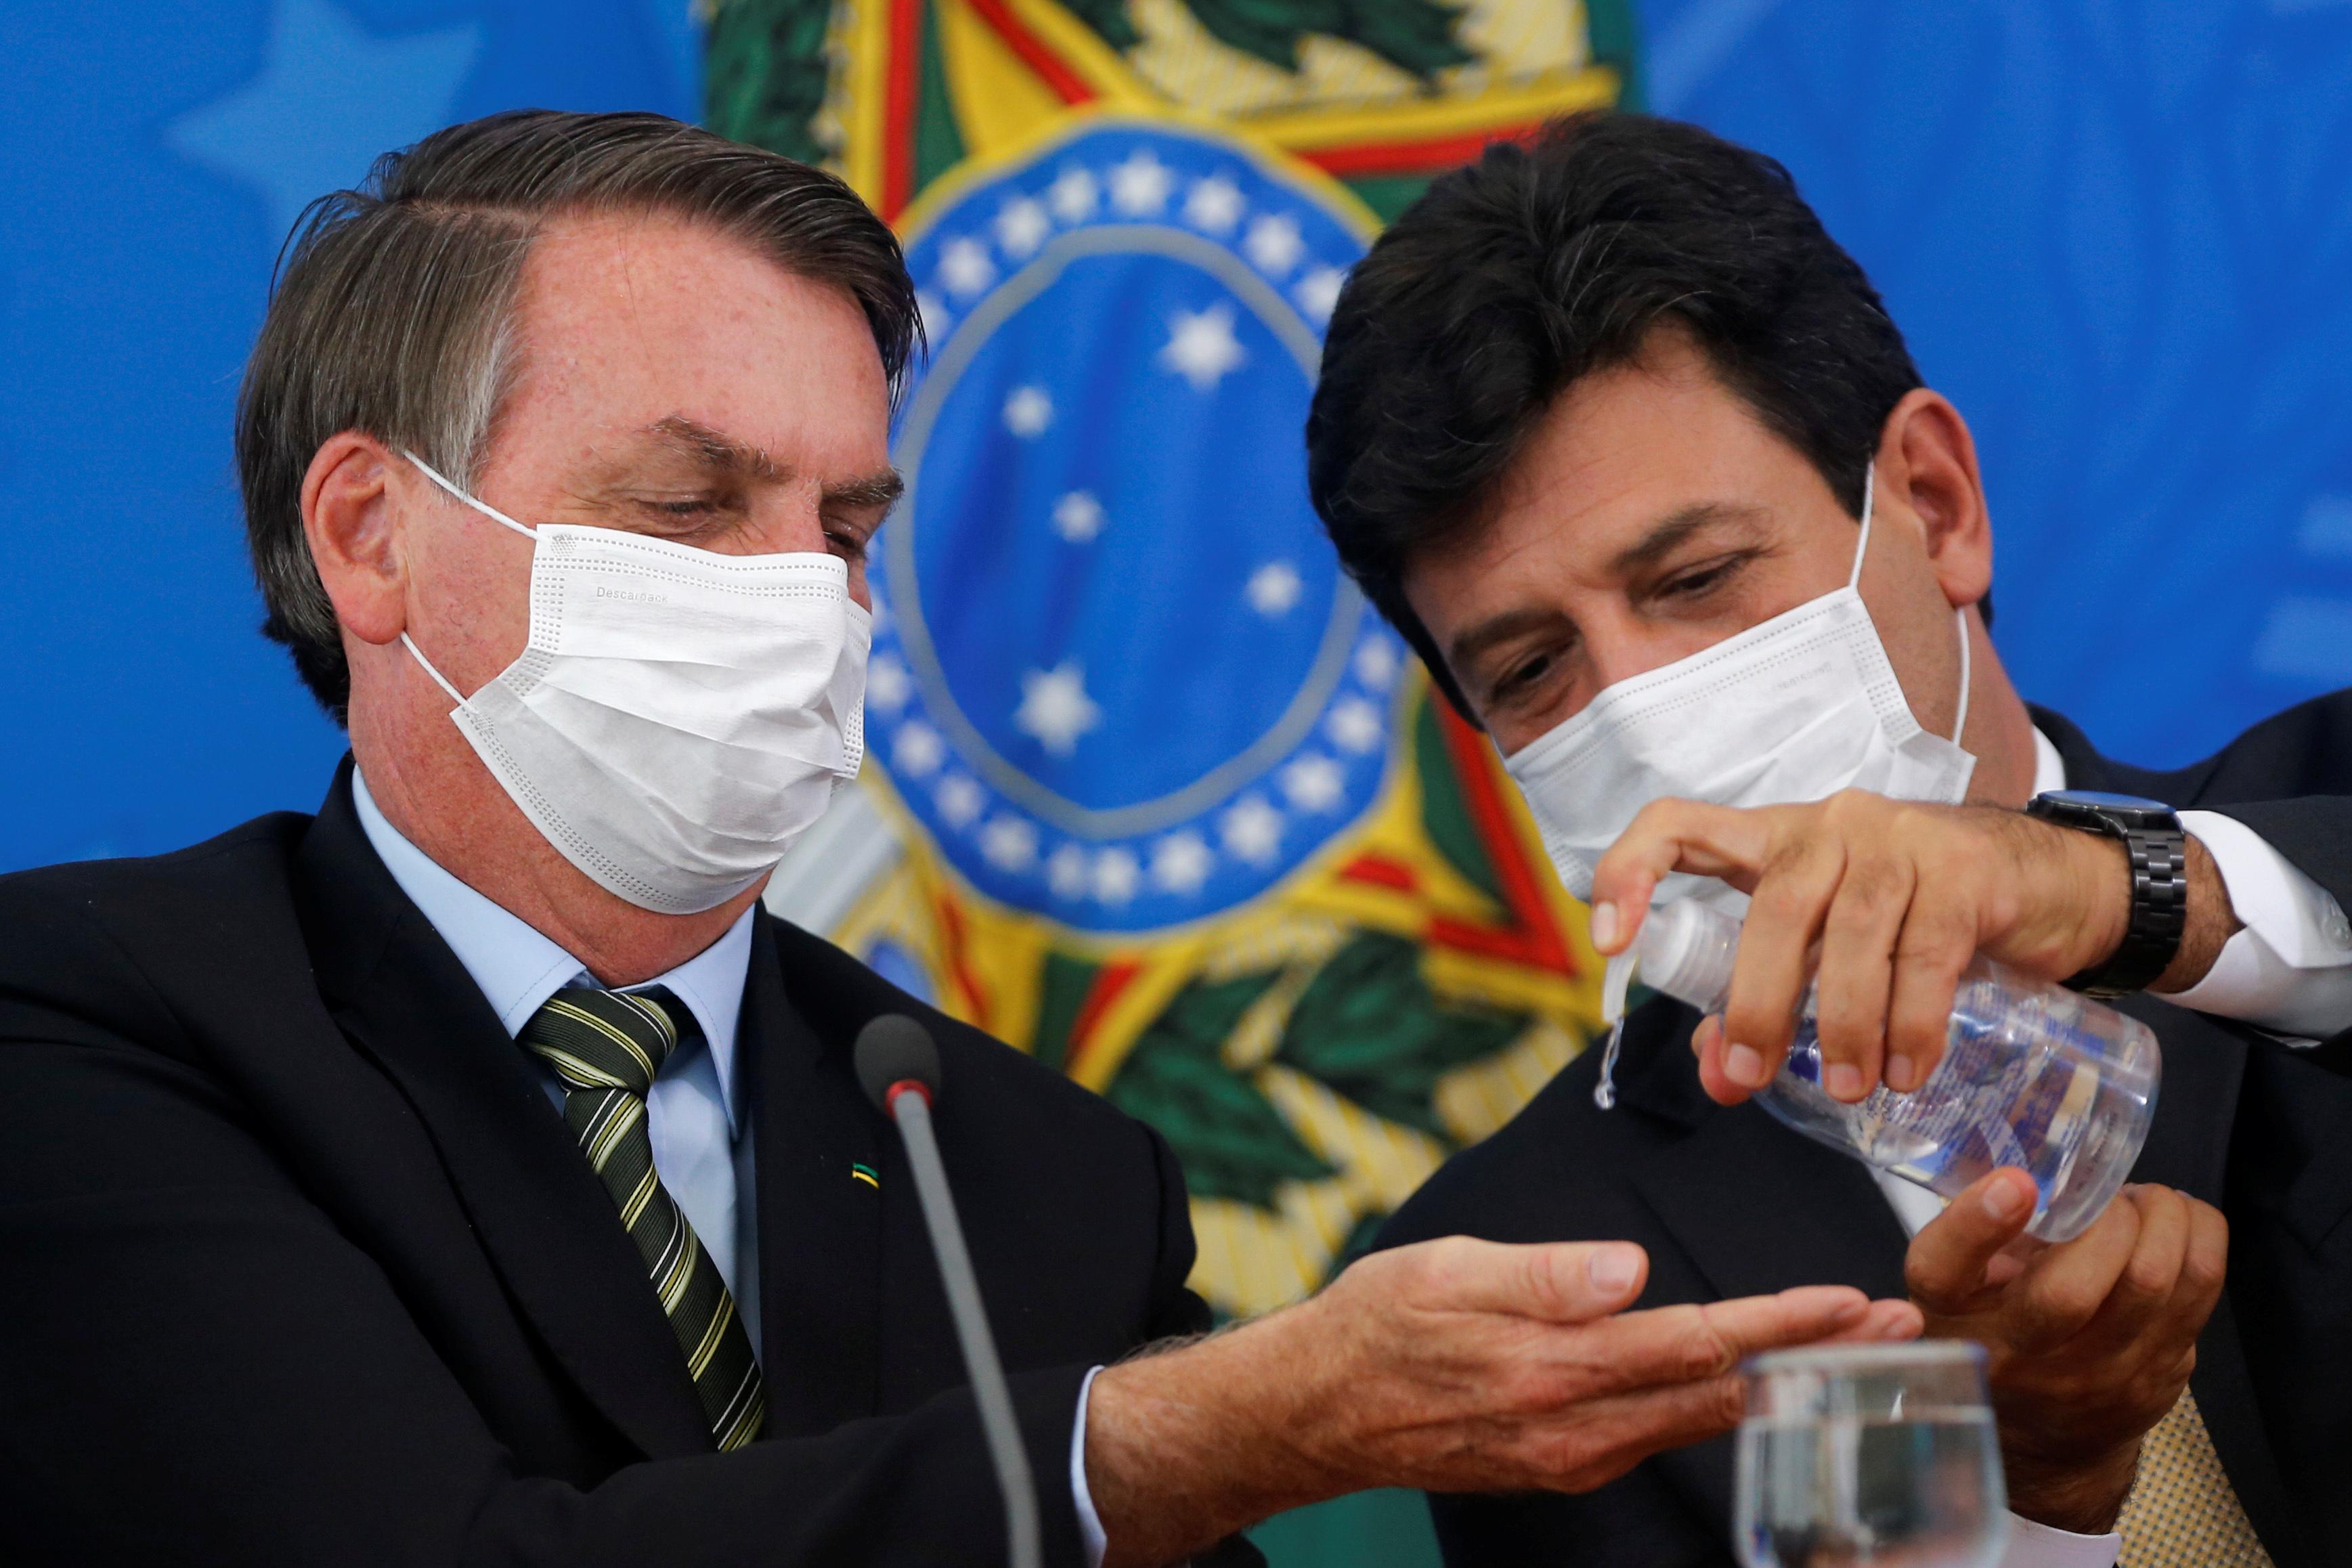 O presidente  Jair Bolsonaro, e o ministro da Saúde, Luiz Henrique Mandetta